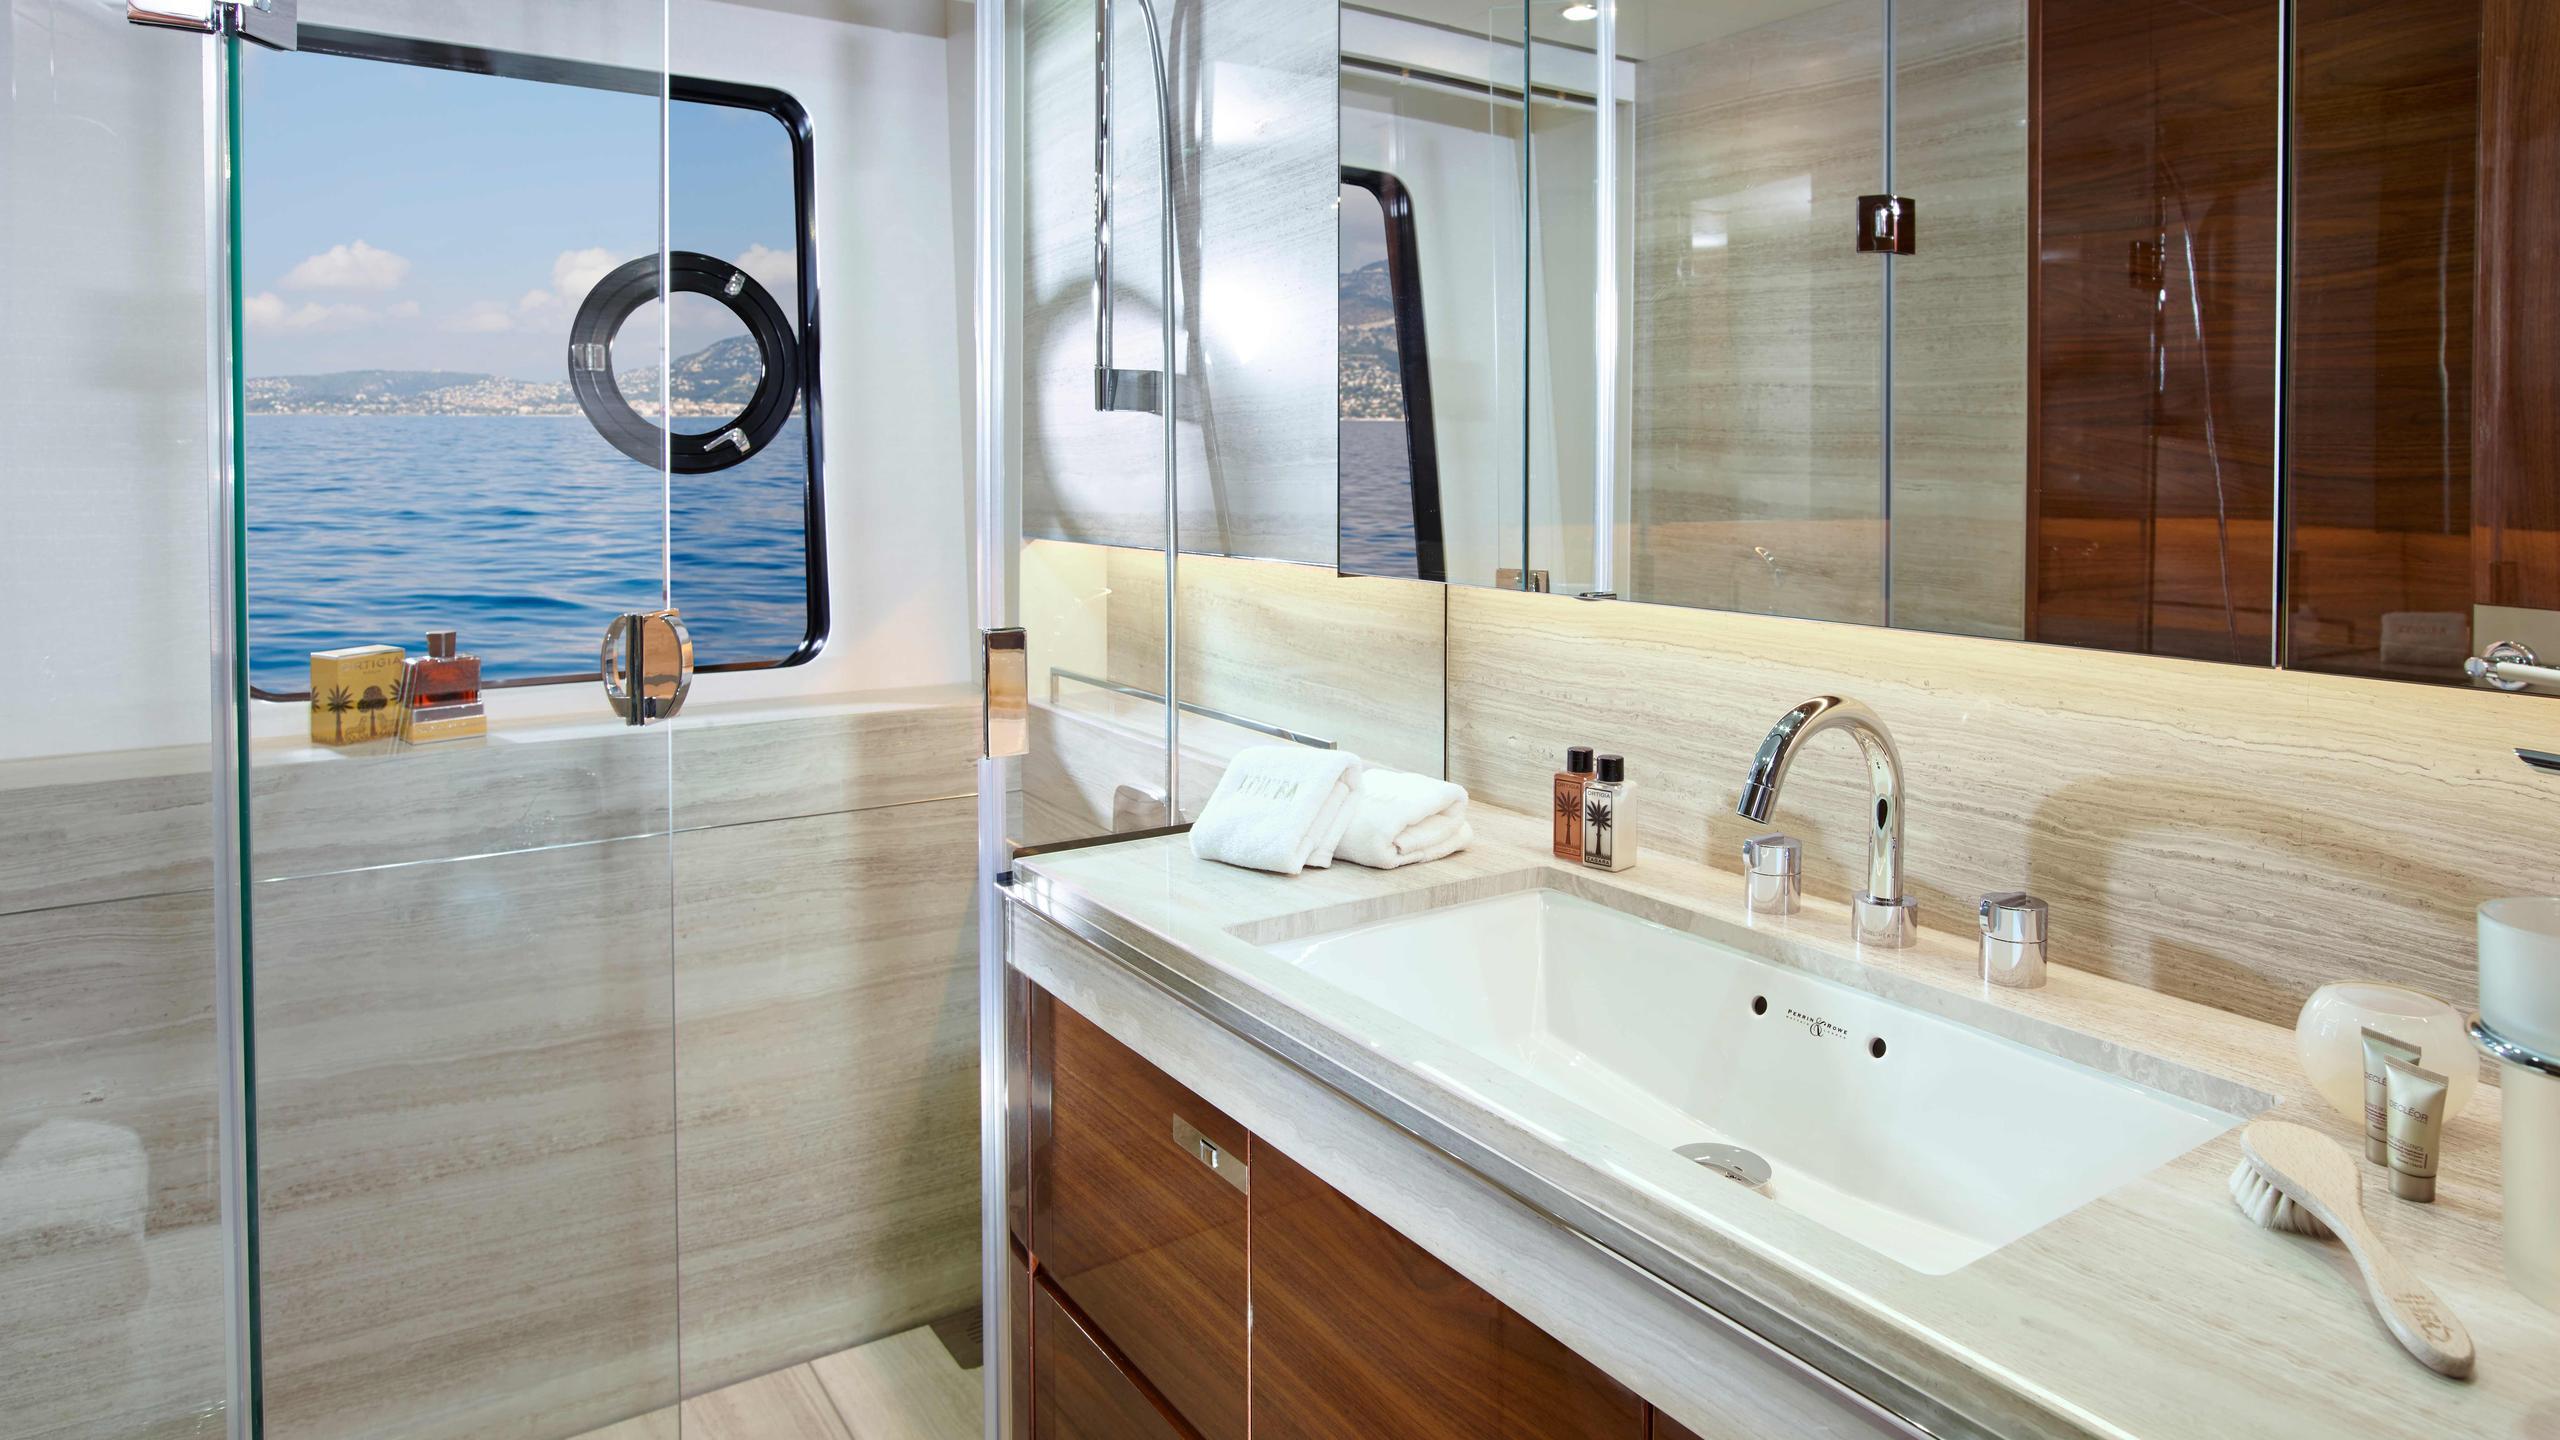 kohuba-motor-yacht-princess-2016-30m-bathroom